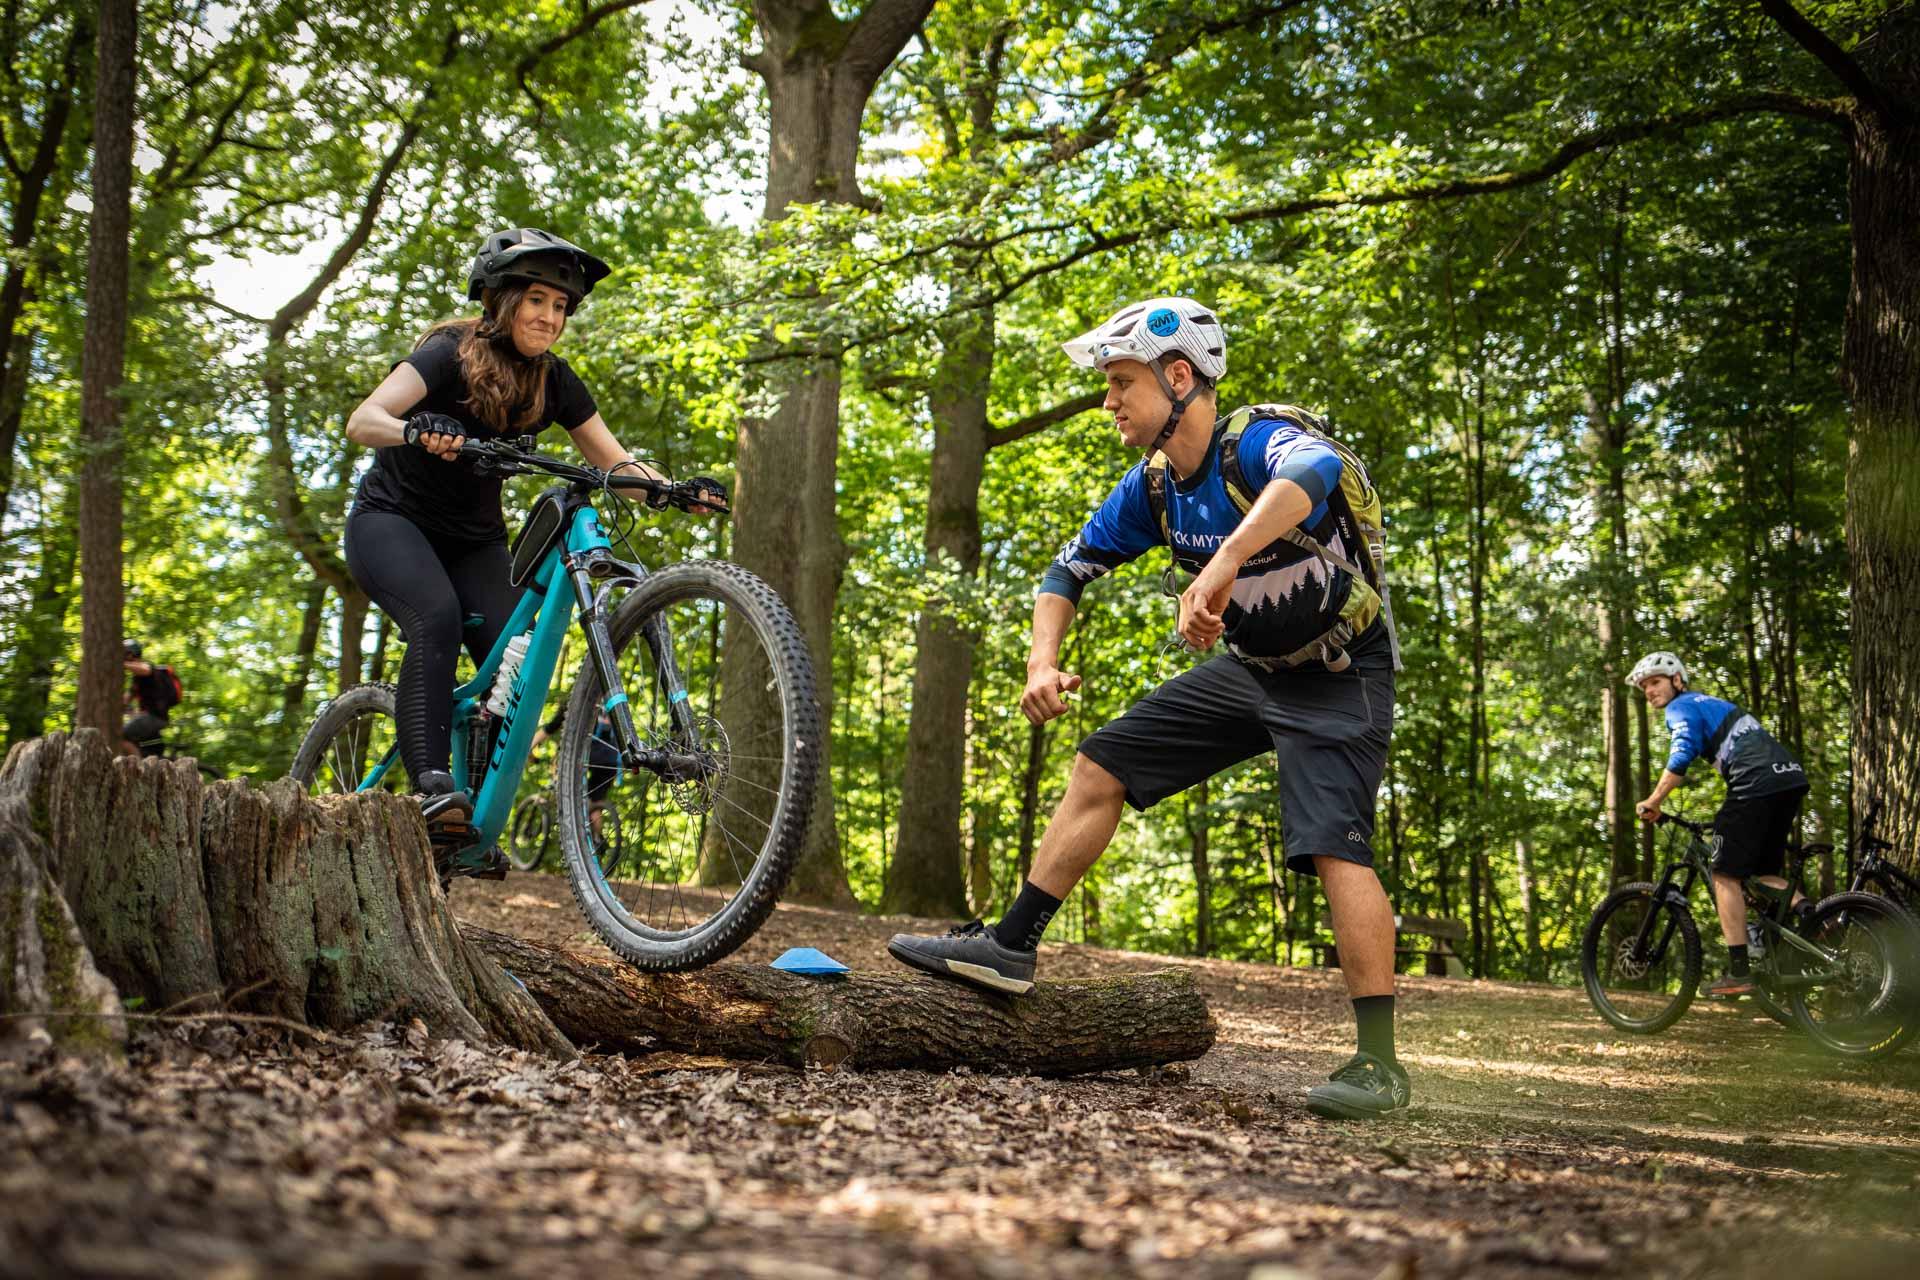 MTB Fahrtechnik Kinder Kurs Basic 8-12 Jahre in München - Mountainbike Basic - Rock my Trail Bikeschule